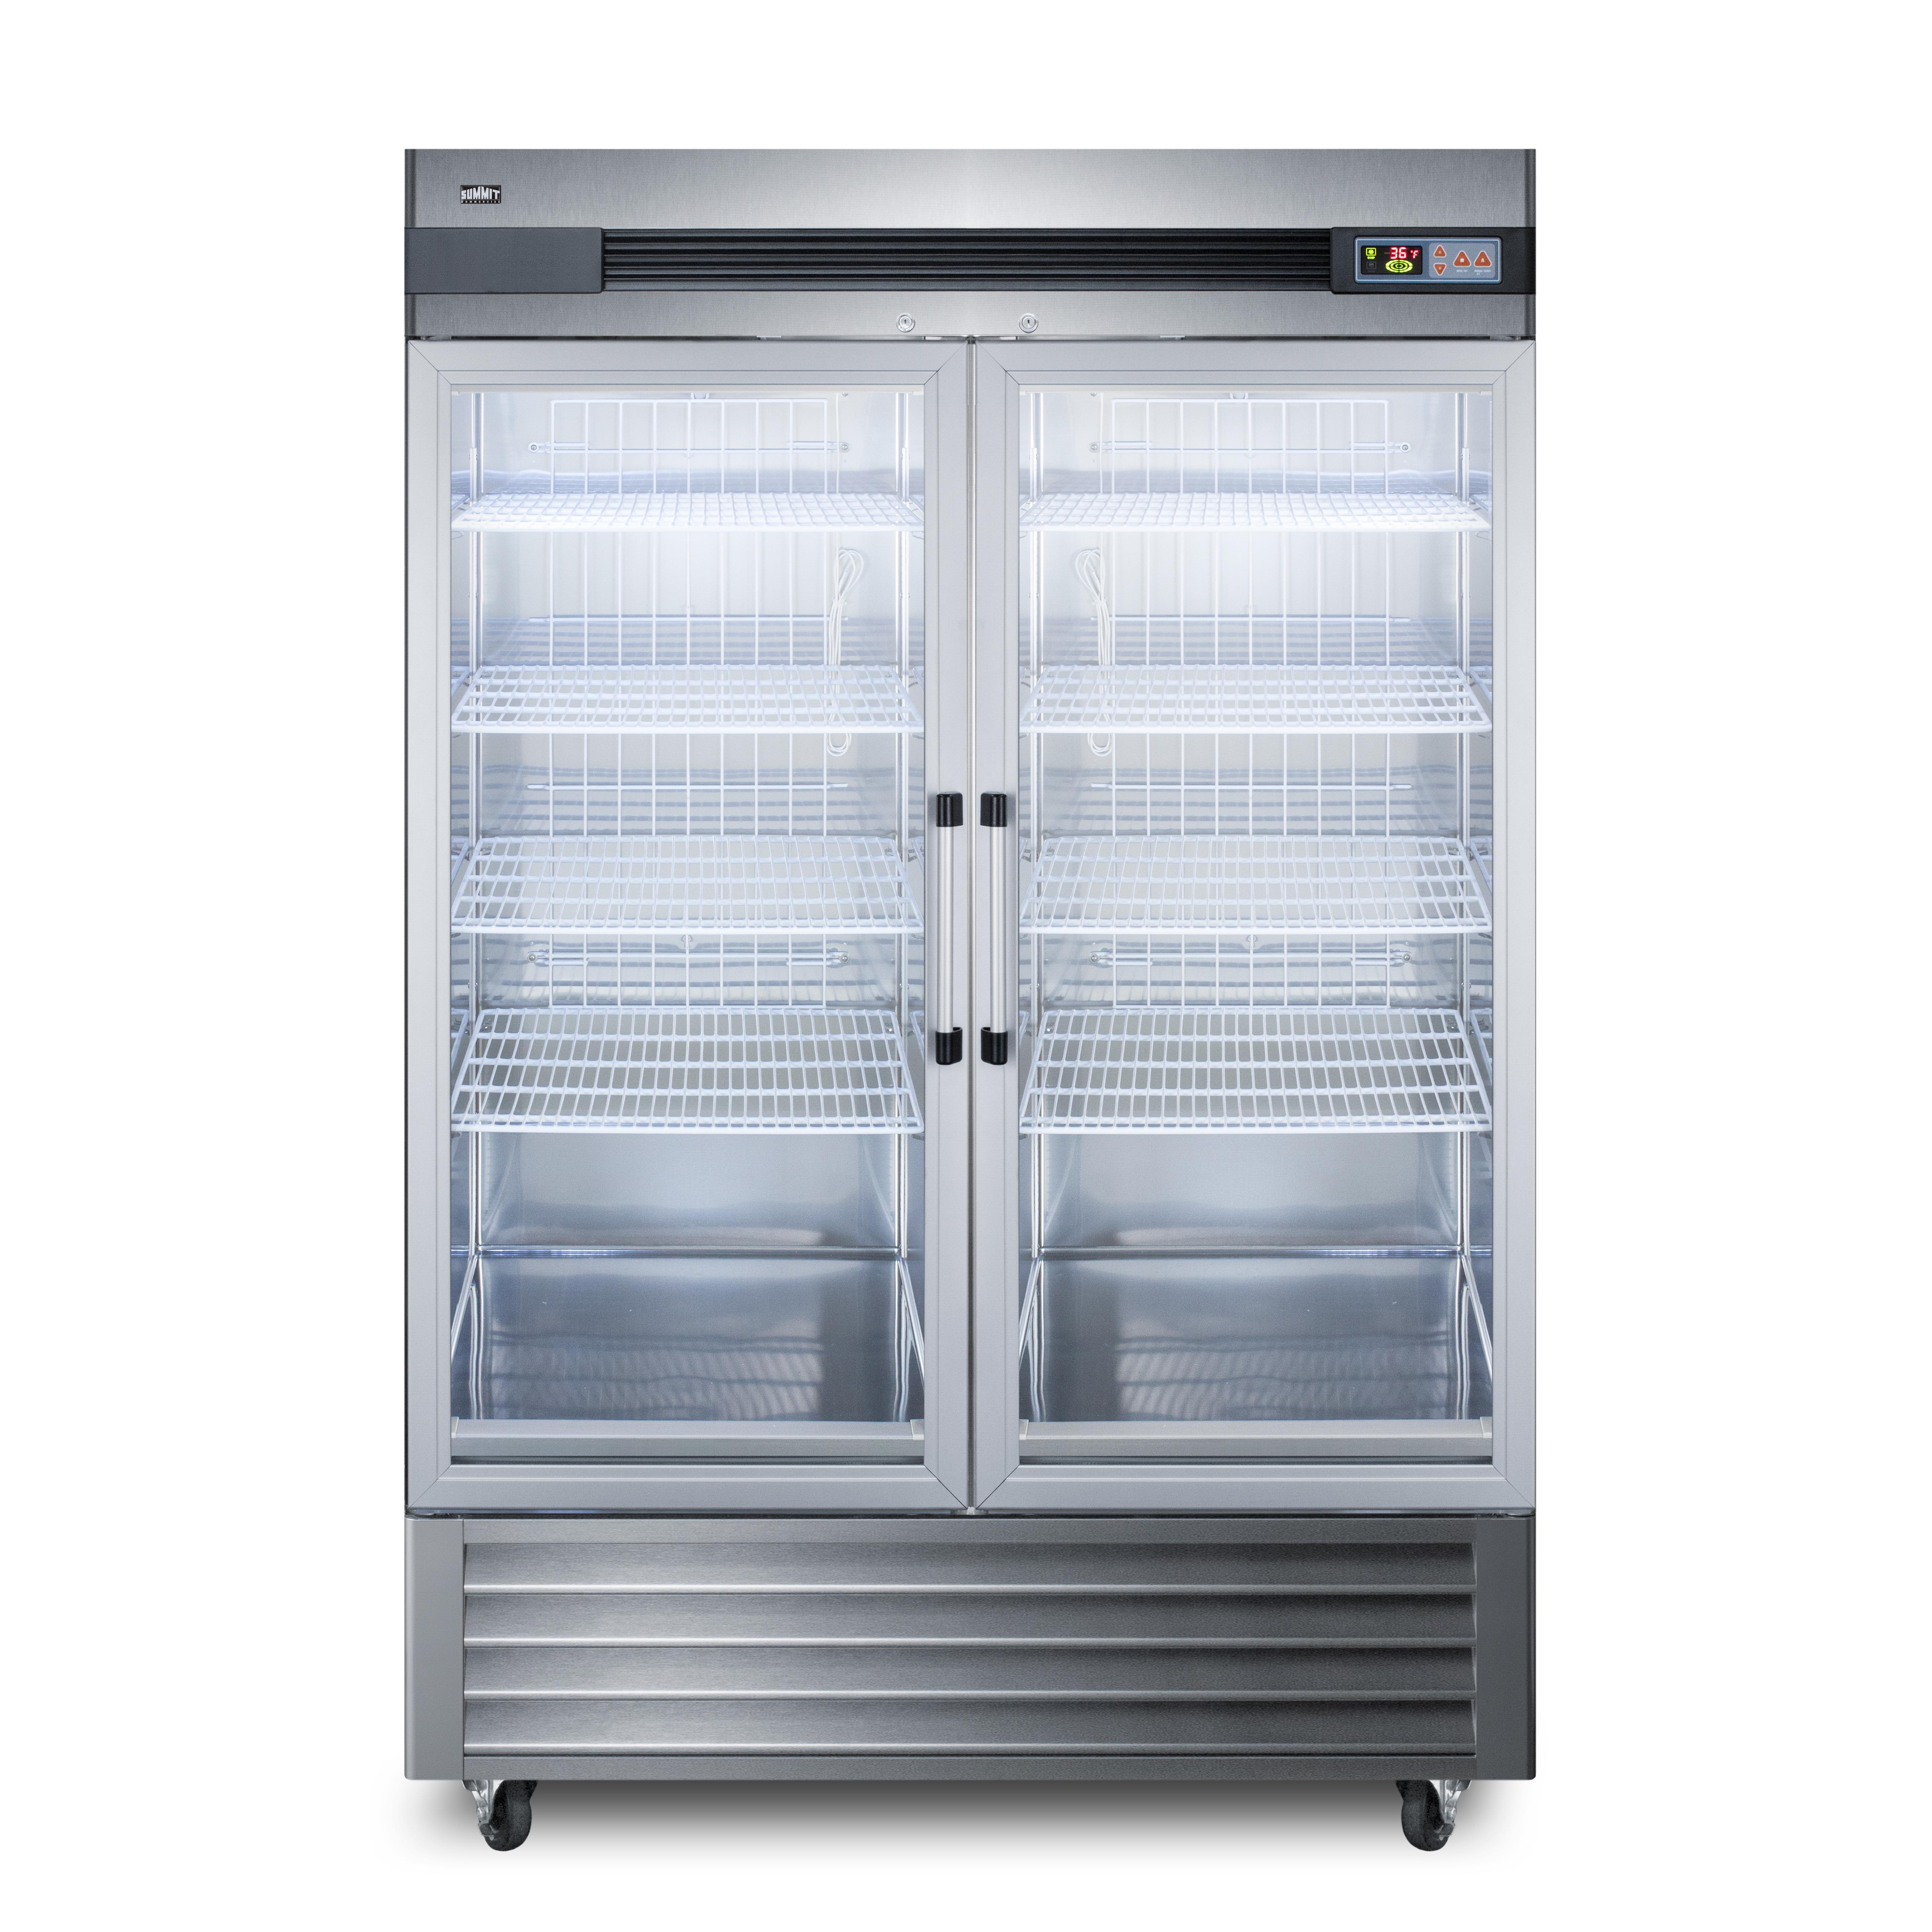 Summit Appliance SCR49SSG refrigerator, reach-in